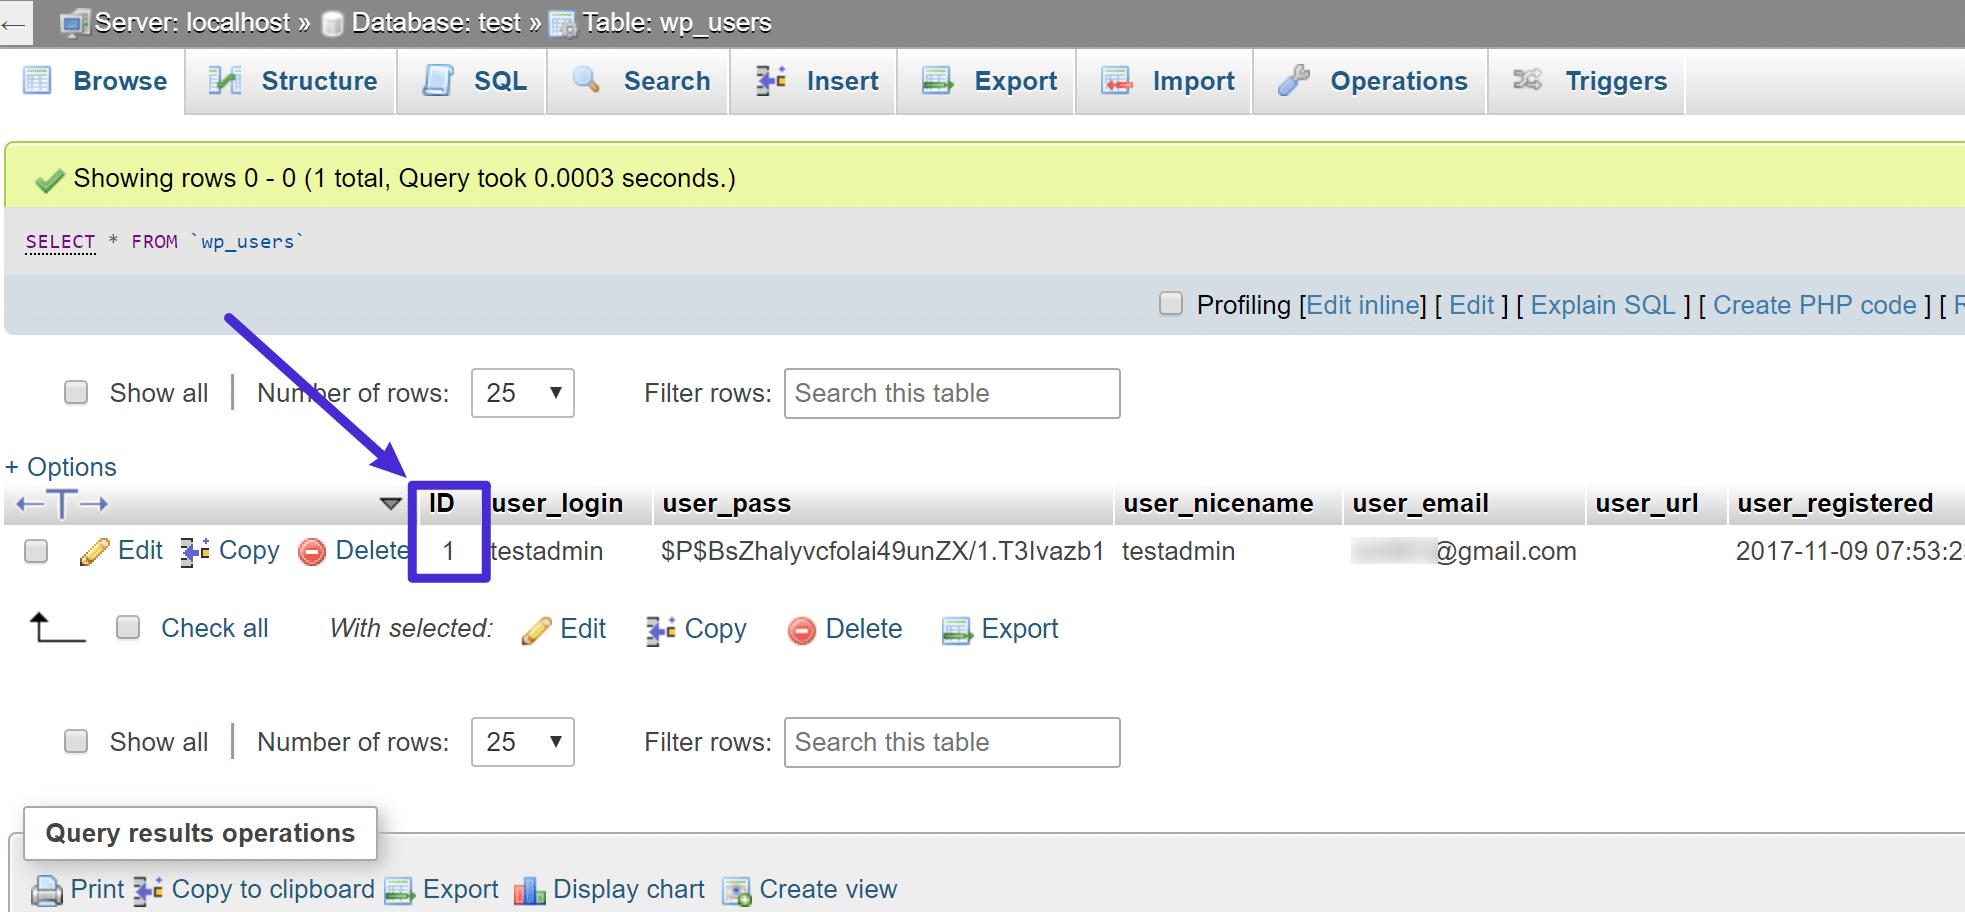 wp_users-tabellen